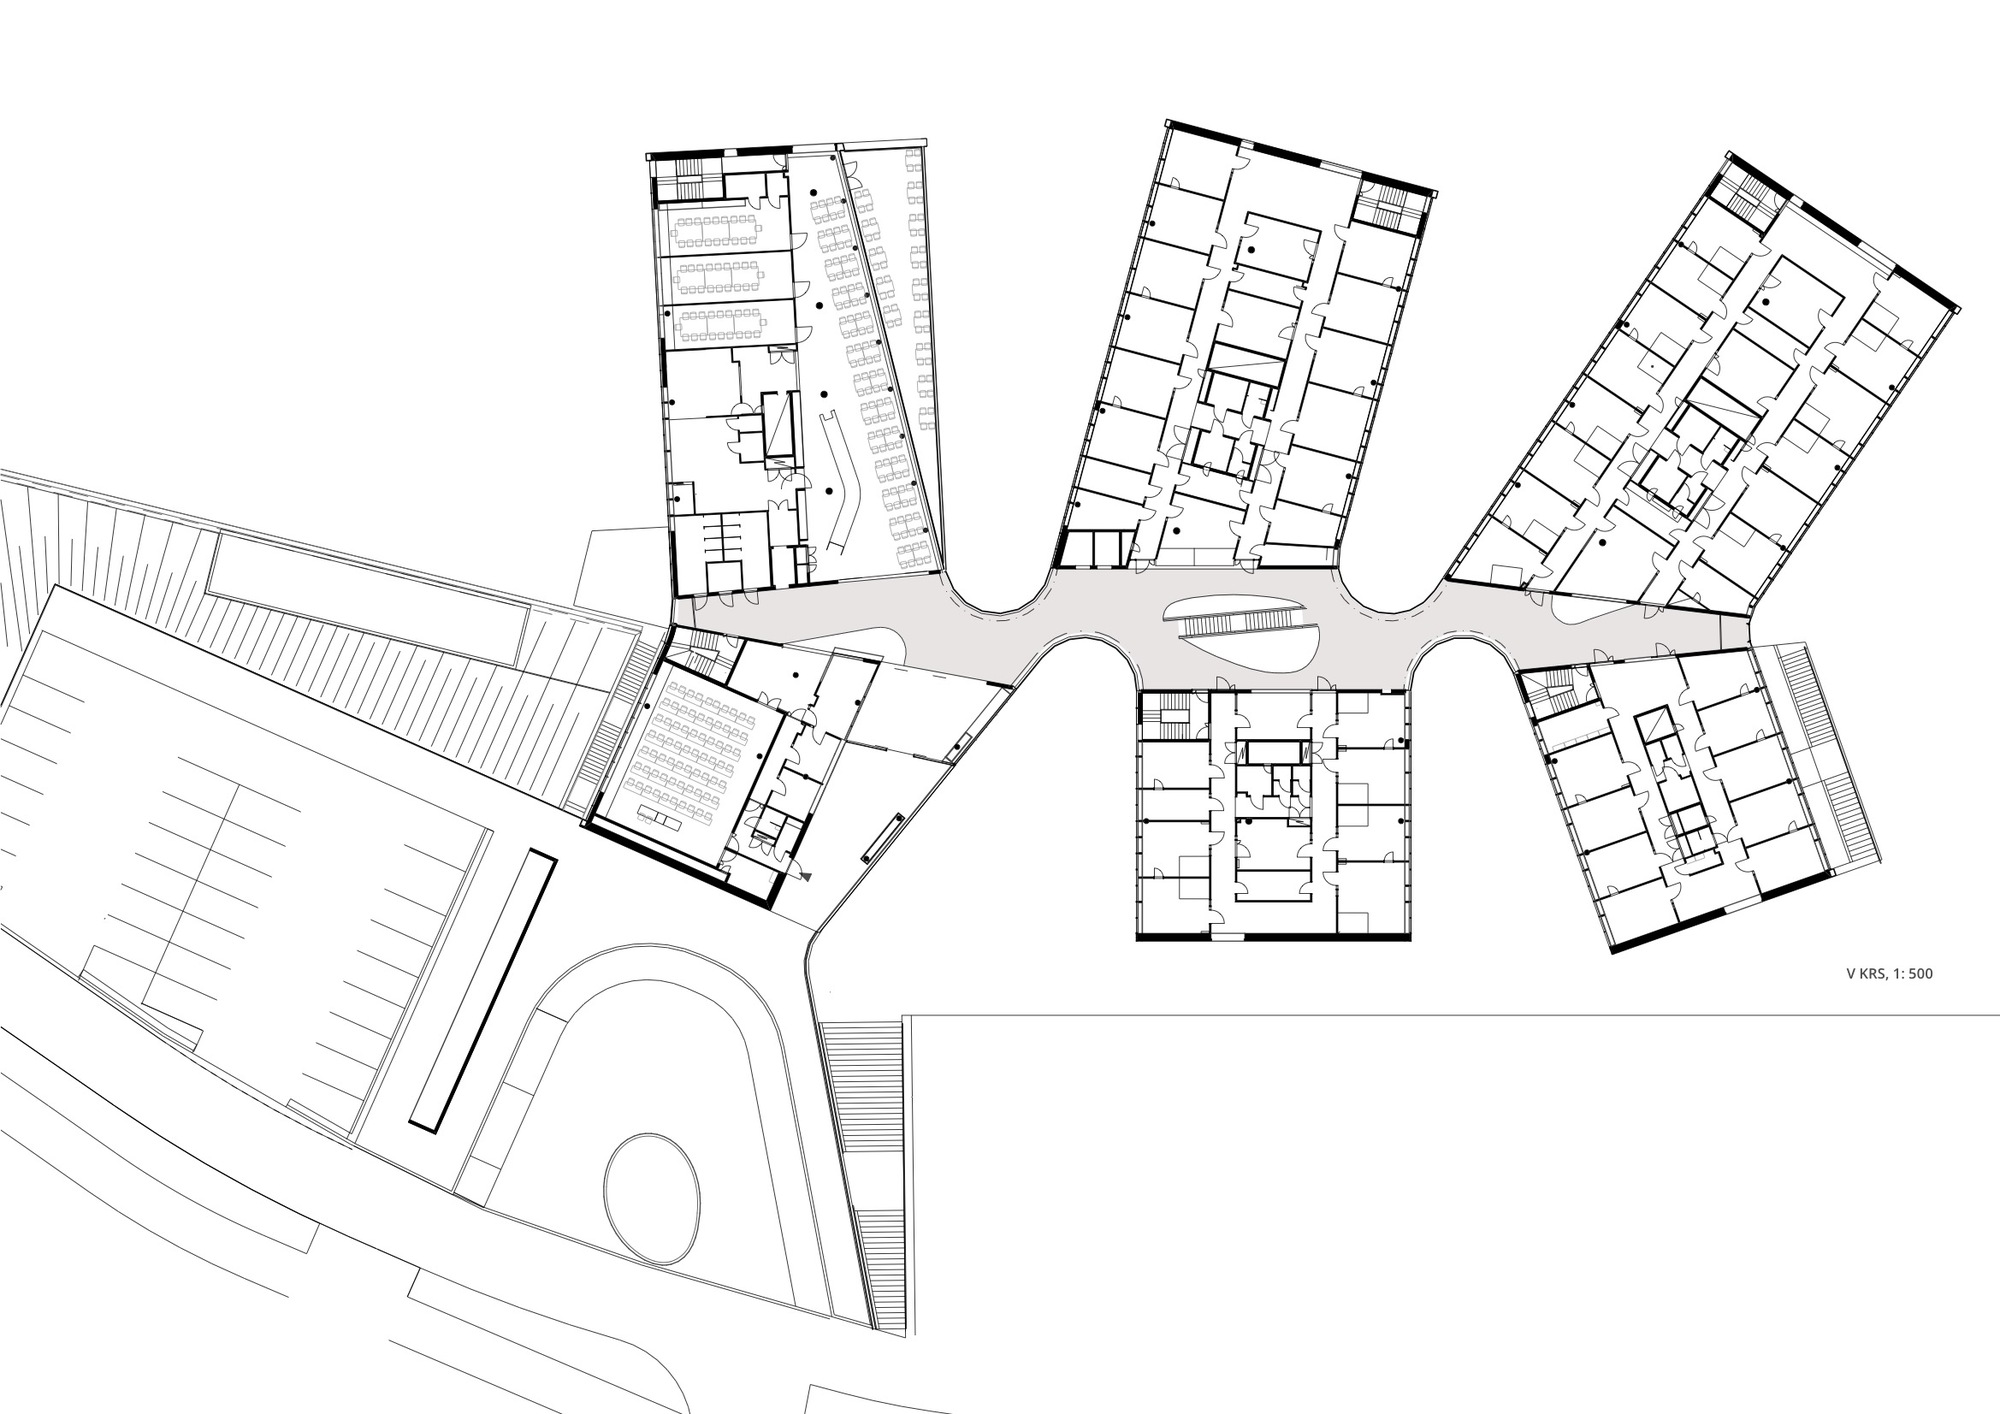 Clinic Floor Plan Gallery Of Tipotie Health Center Sigge Arkkitehdit Oy 13